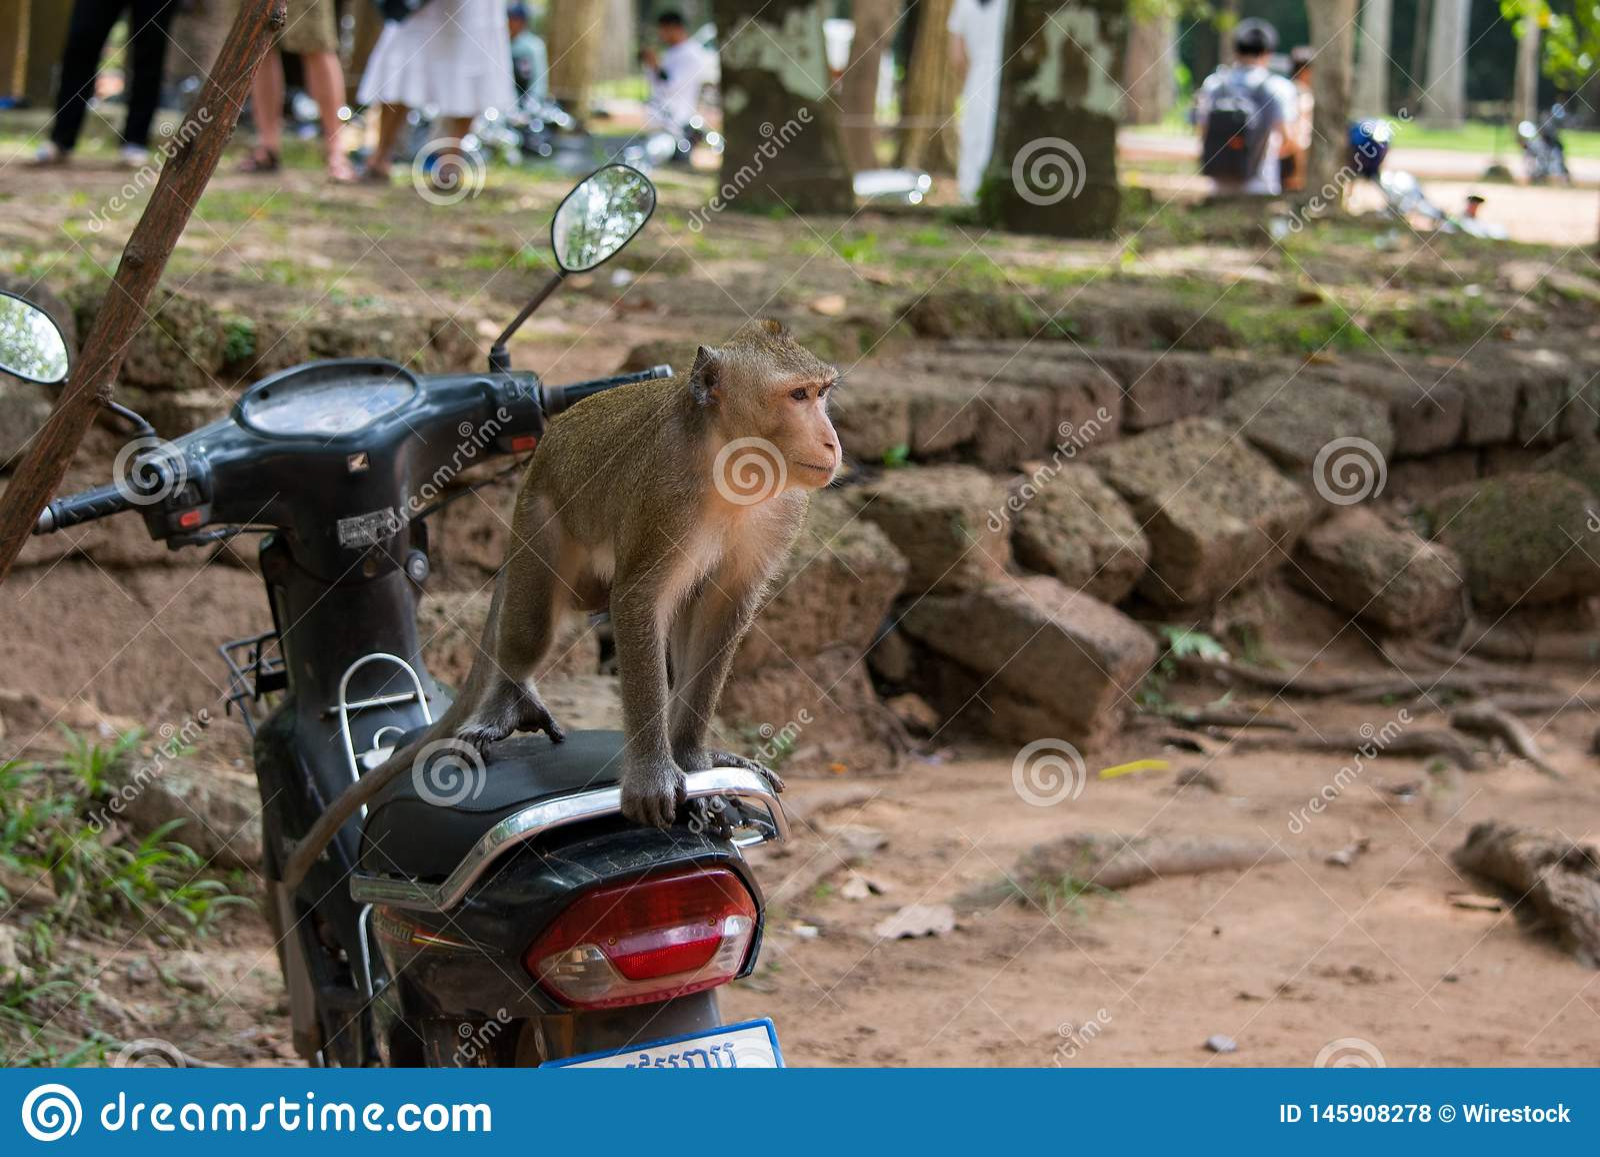 Macaque Monkey on a motor bike